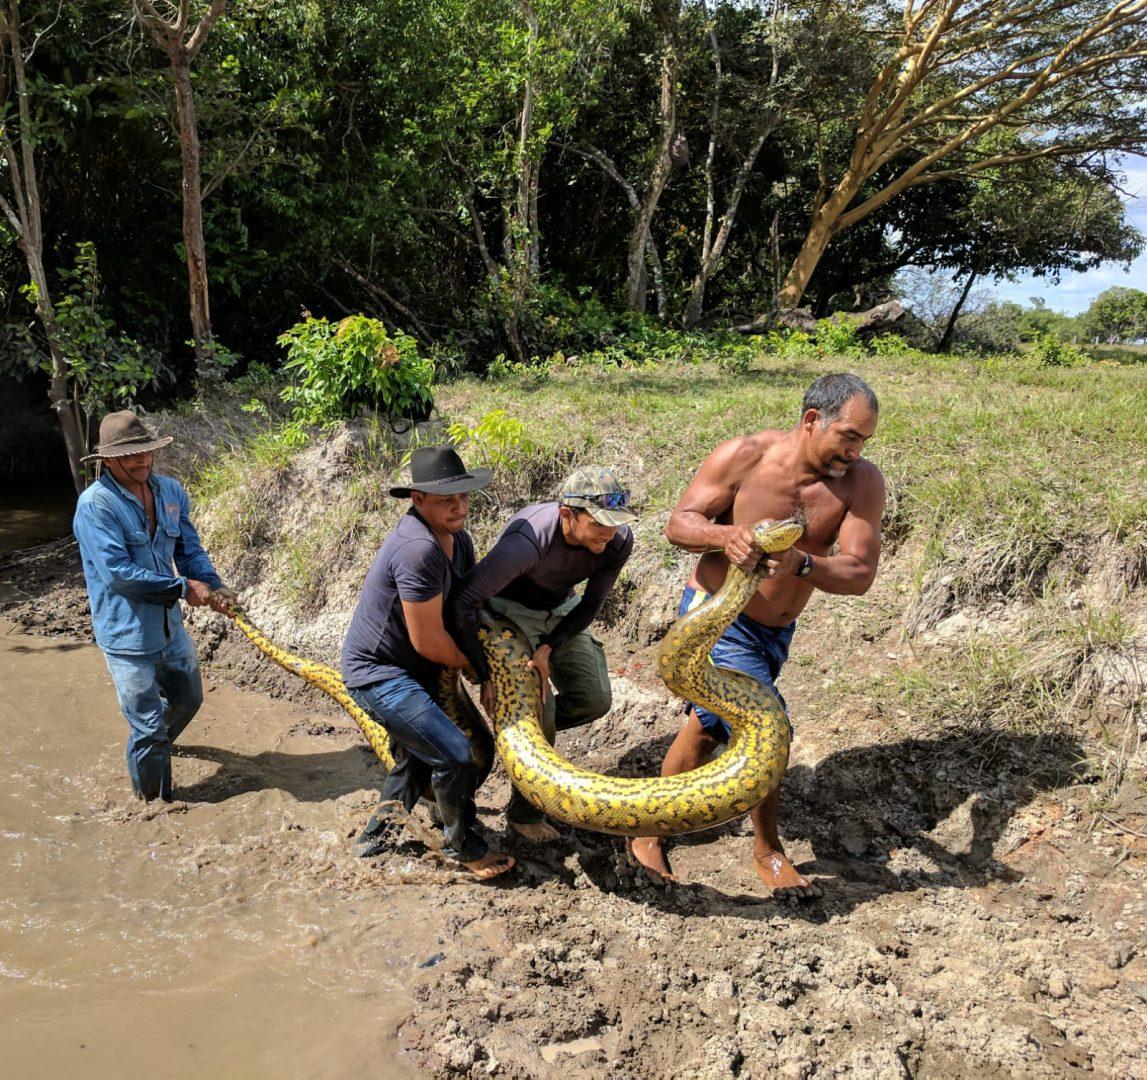 Anaconda (photo credit Nancy Engel)